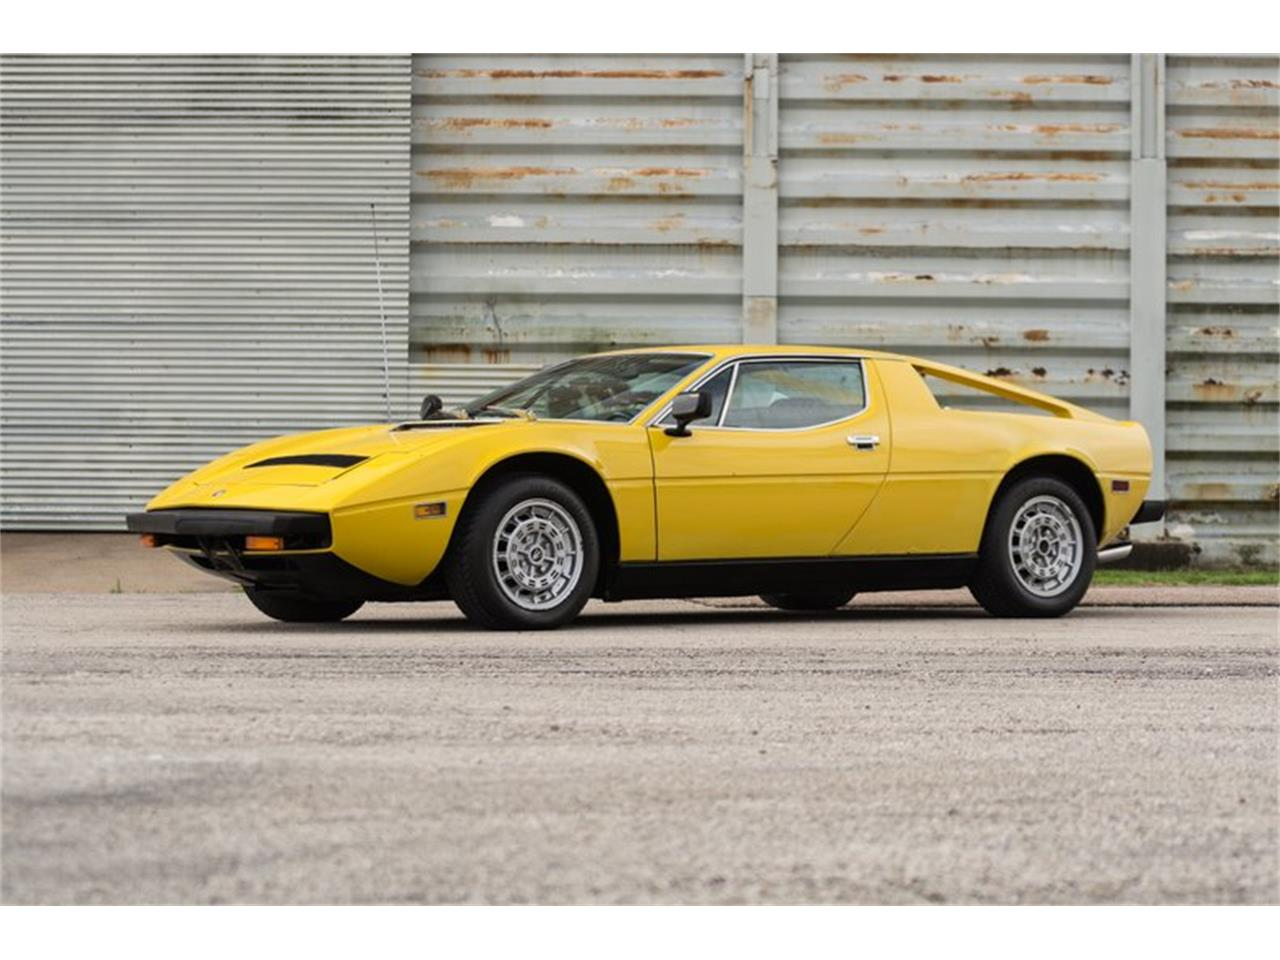 1979 Maserati Merak SS for Sale   ClassicCars.com   CC-1209975